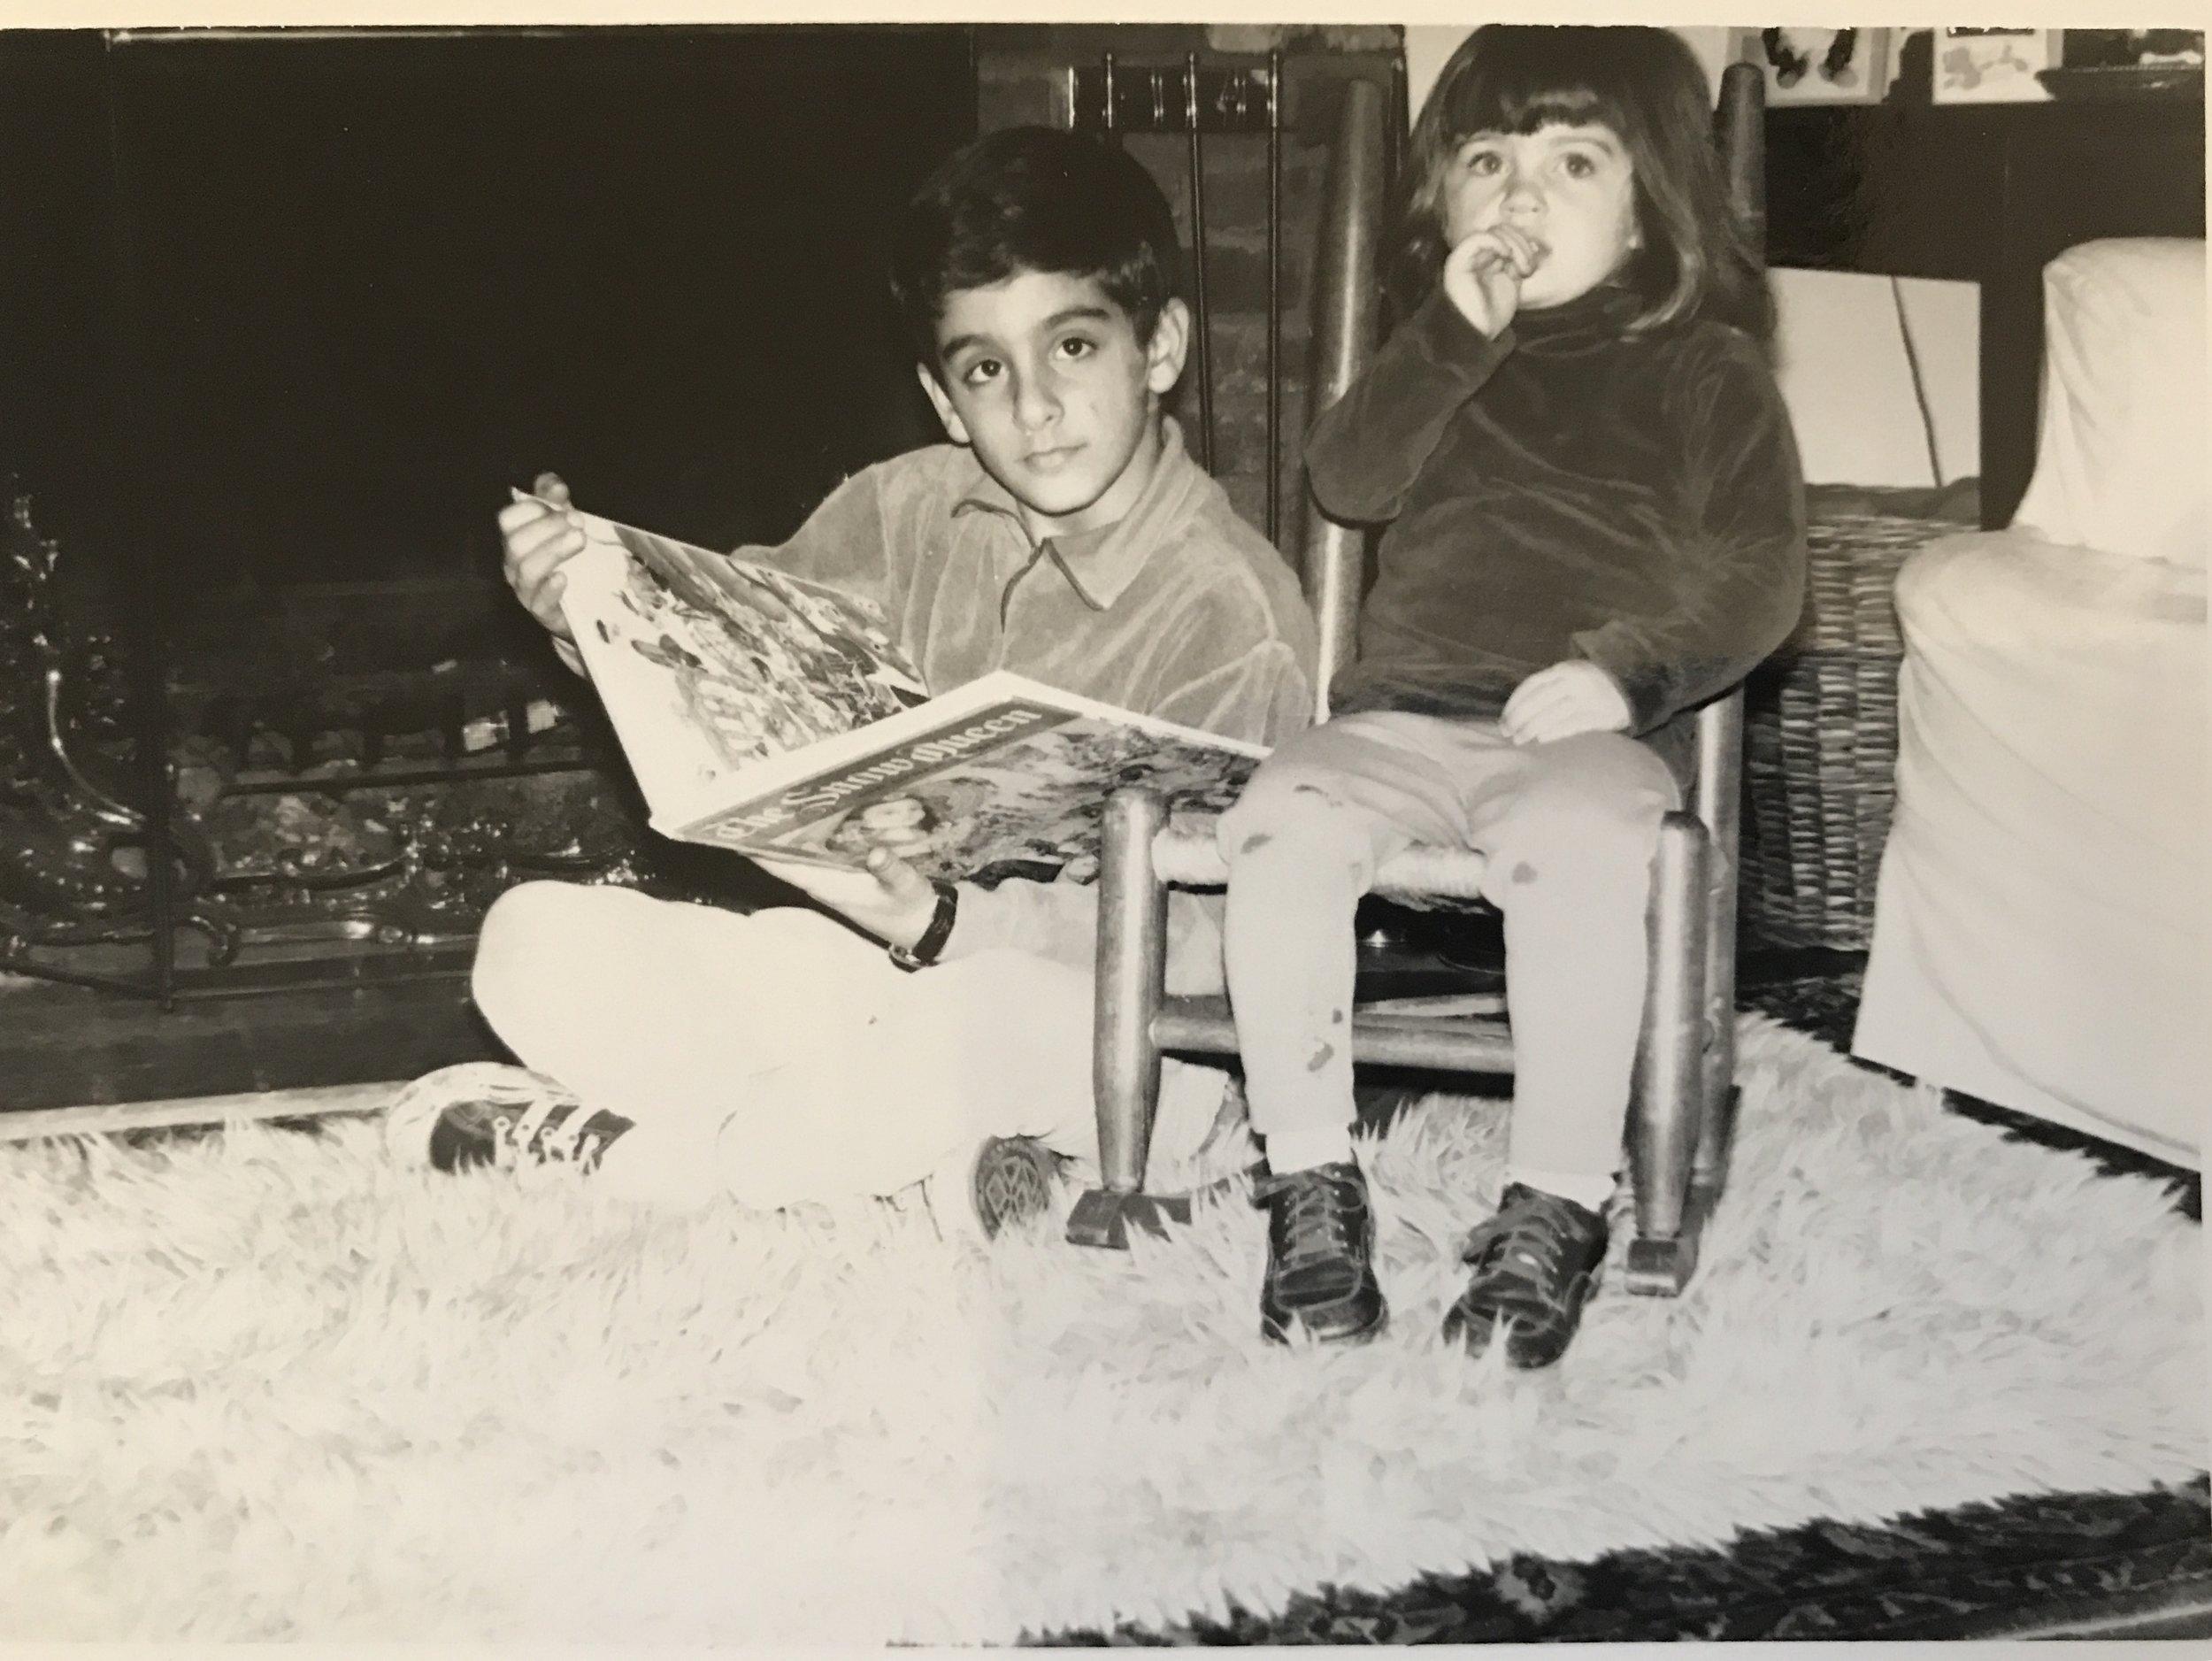 Happier times before my parent's divorce